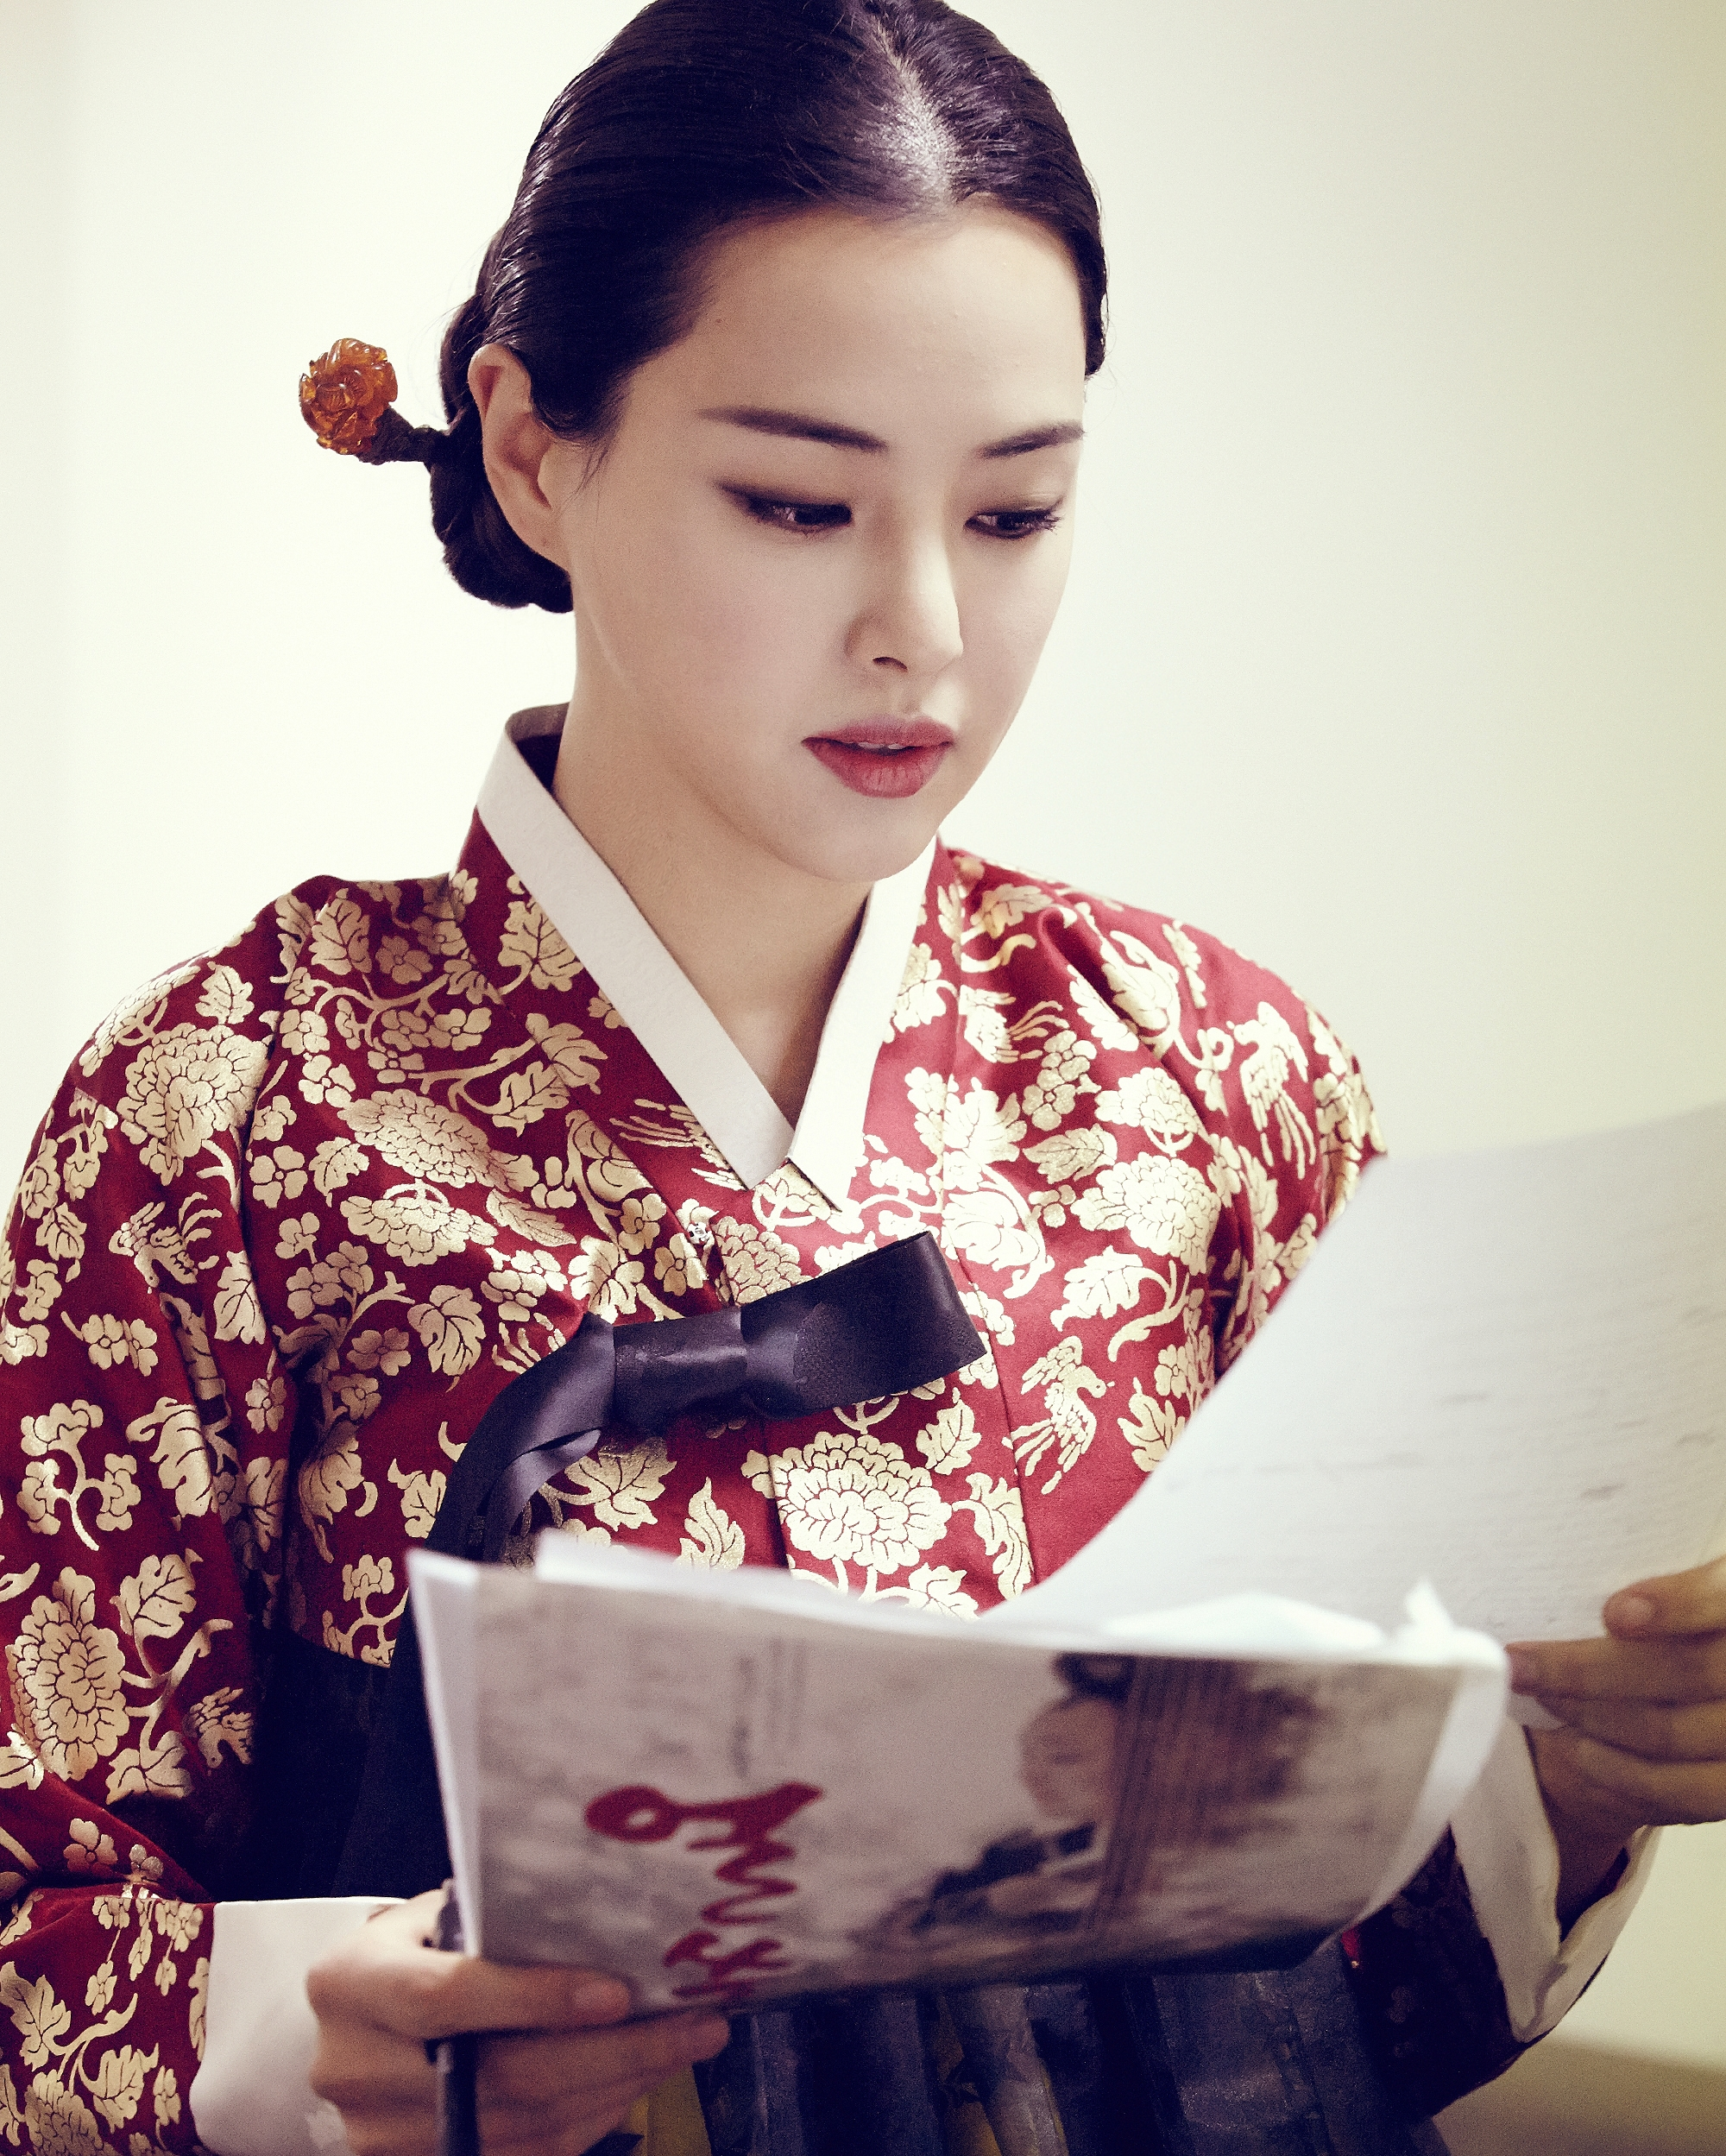 File:Lee Ha-nui3 jpg - Wikimedia Commons